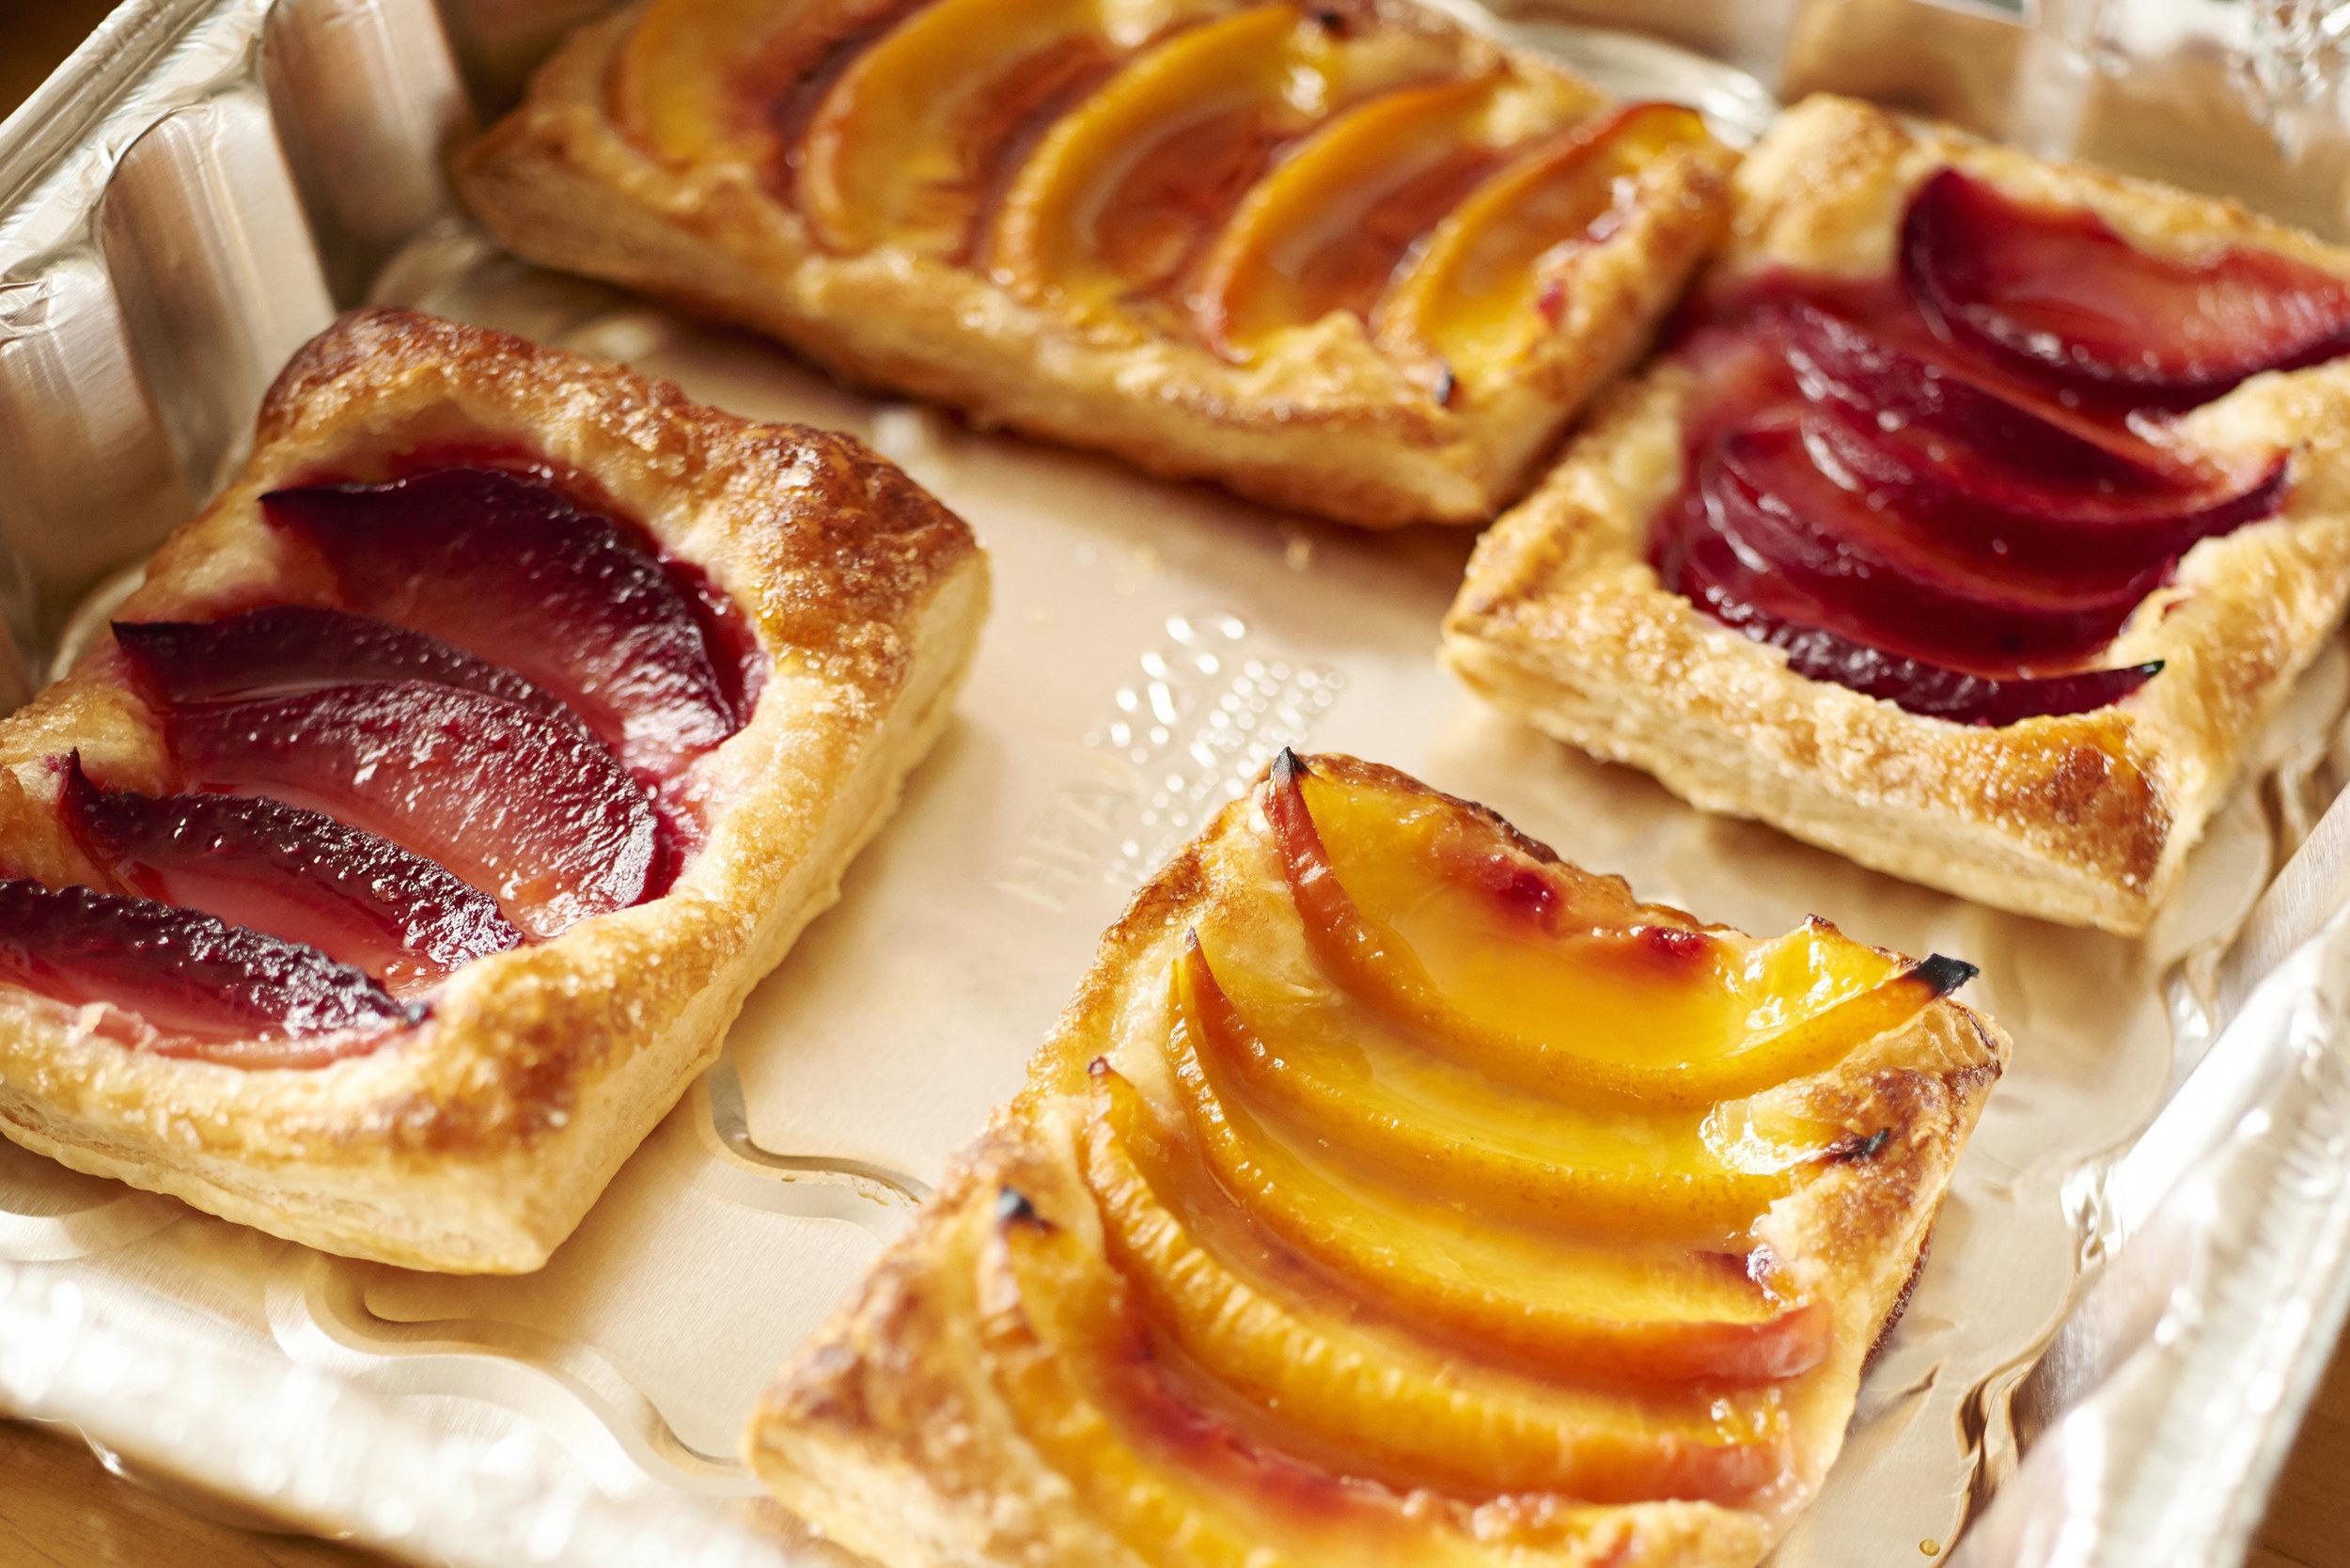 Donuts-Sugar-Baking_0067_copy_original.jpg